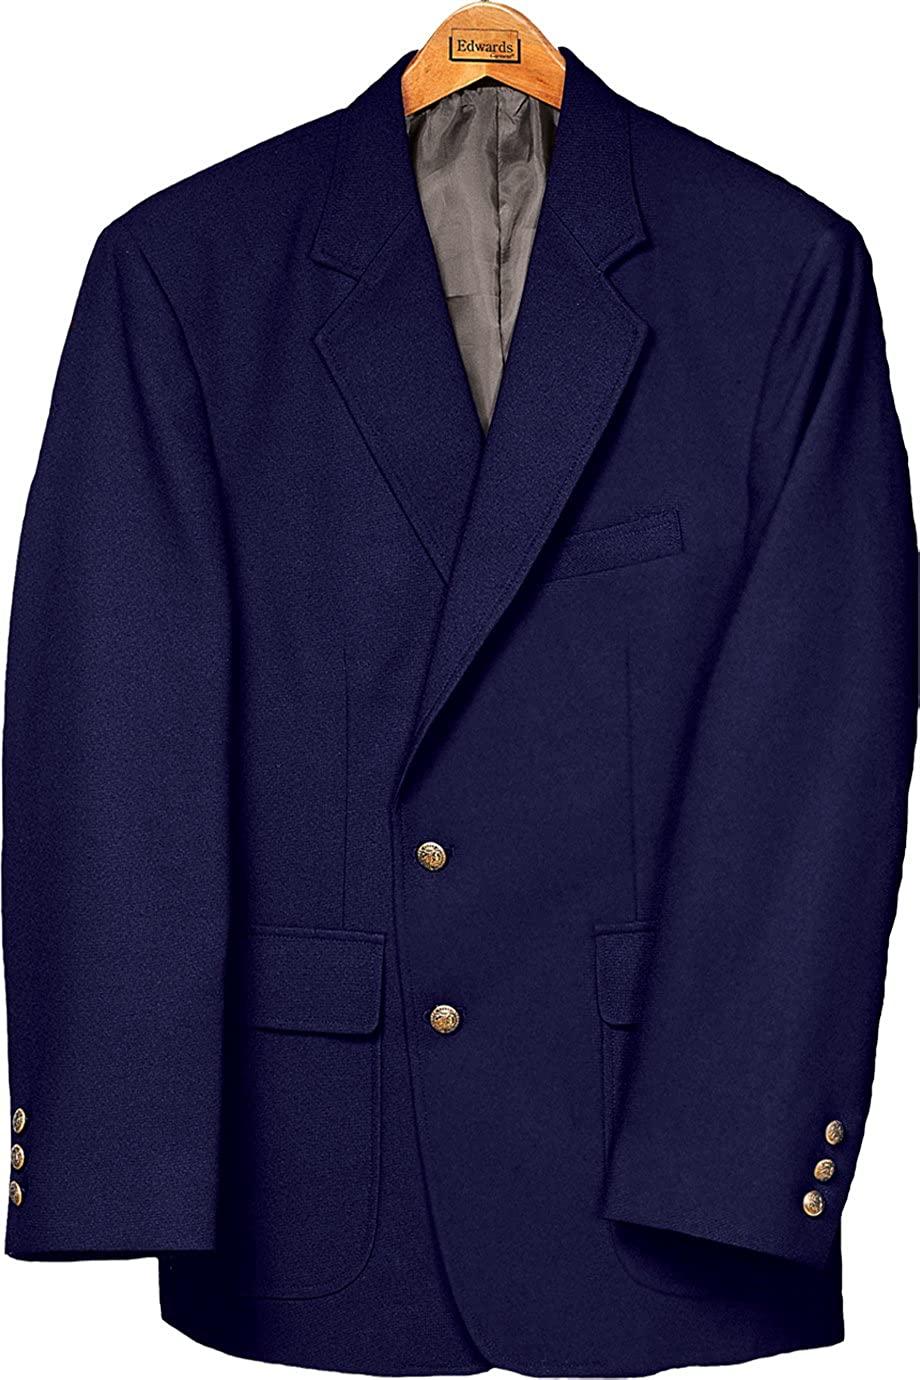 Edwards Men's Value Poly Blazer, NAVY, 54